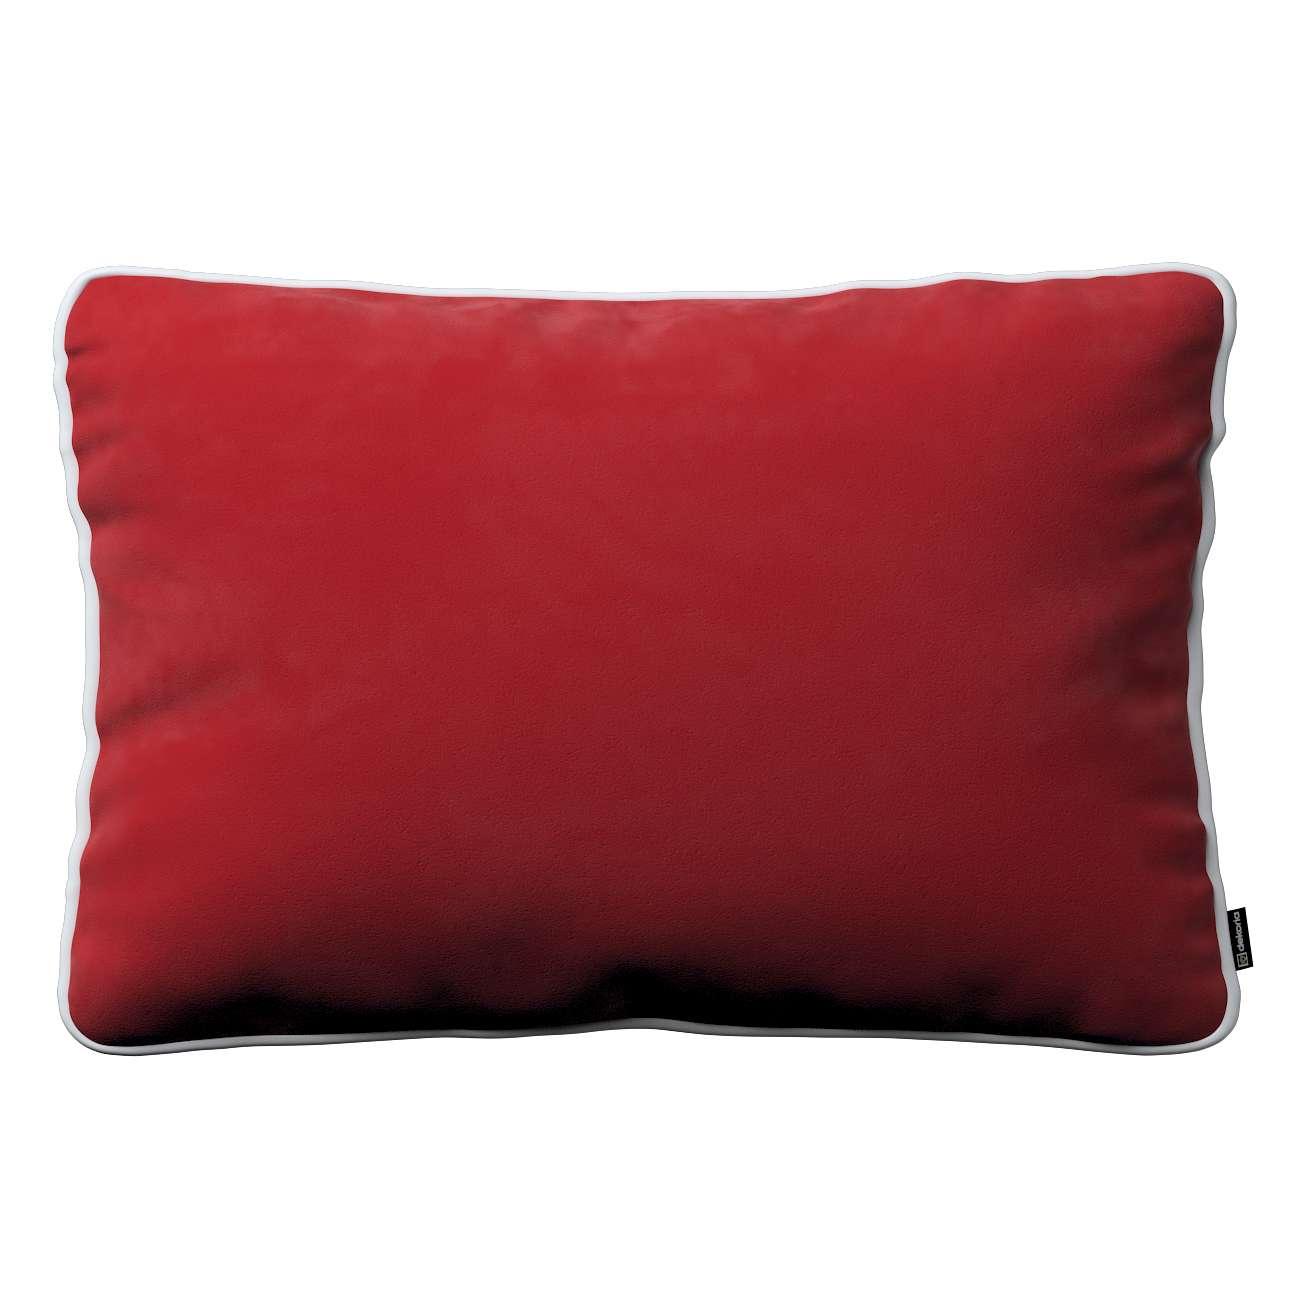 Poszewka Laura na poduszkę prostokątna 60 × 40 cm w kolekcji Velvet, tkanina: 704-15